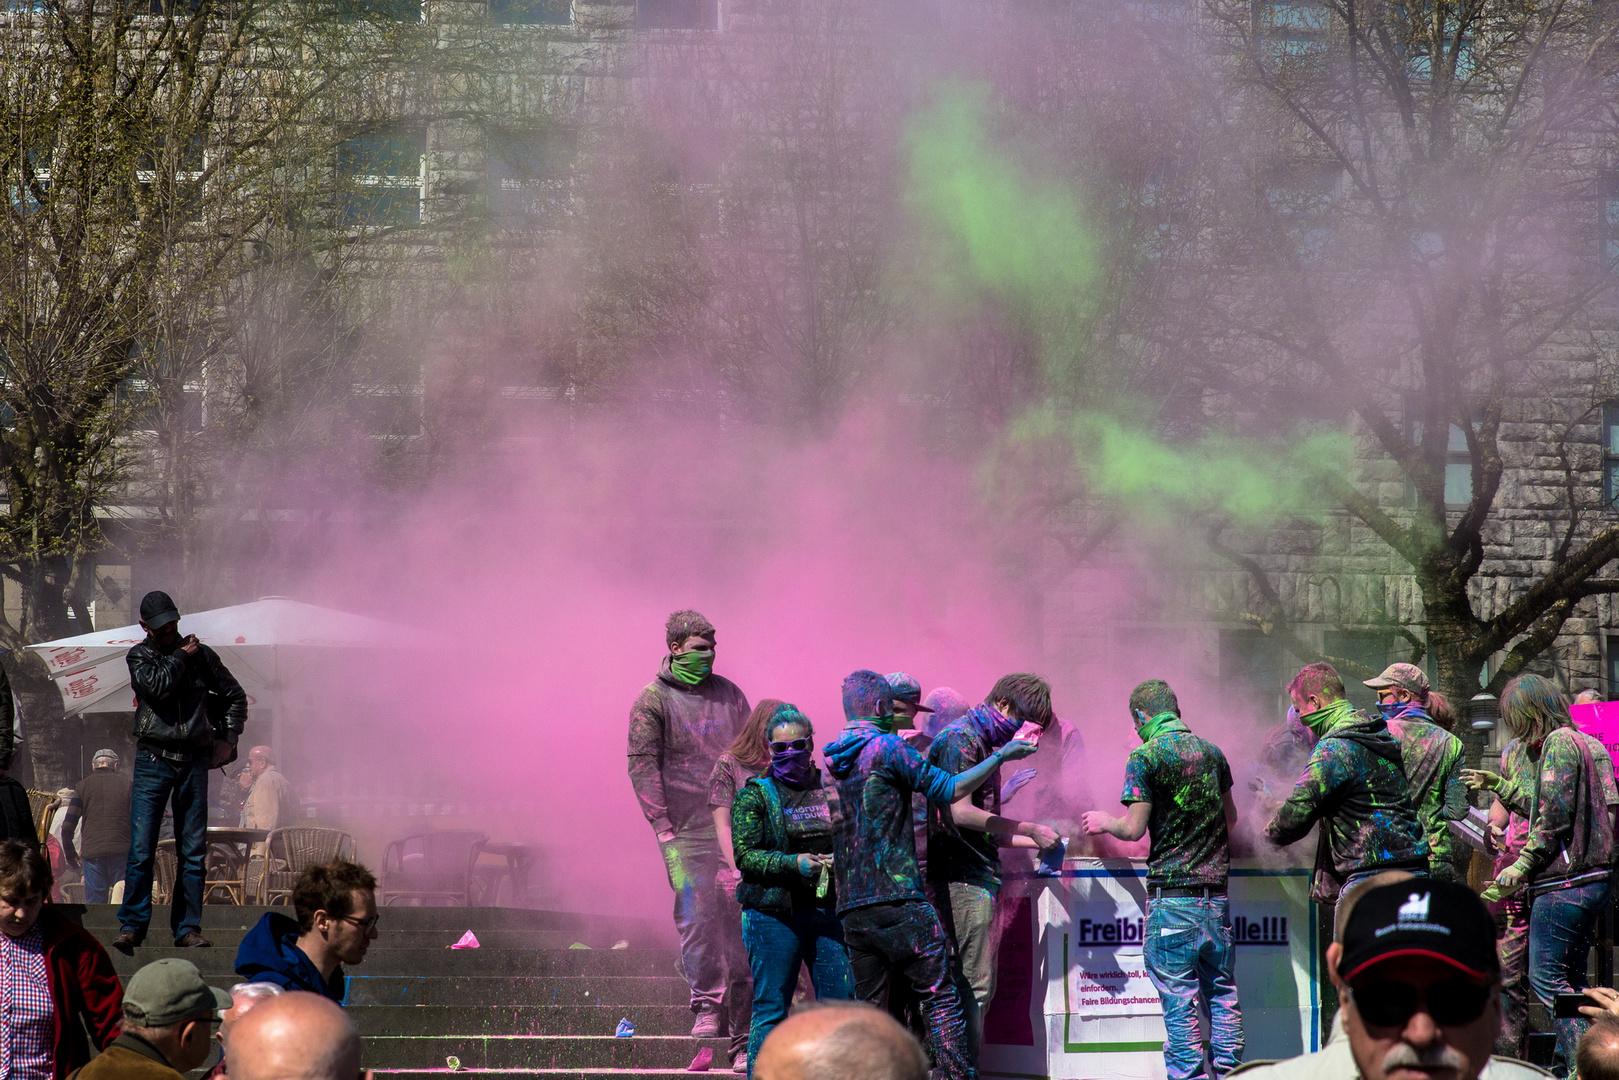 Bunte Protestaktion in Essen